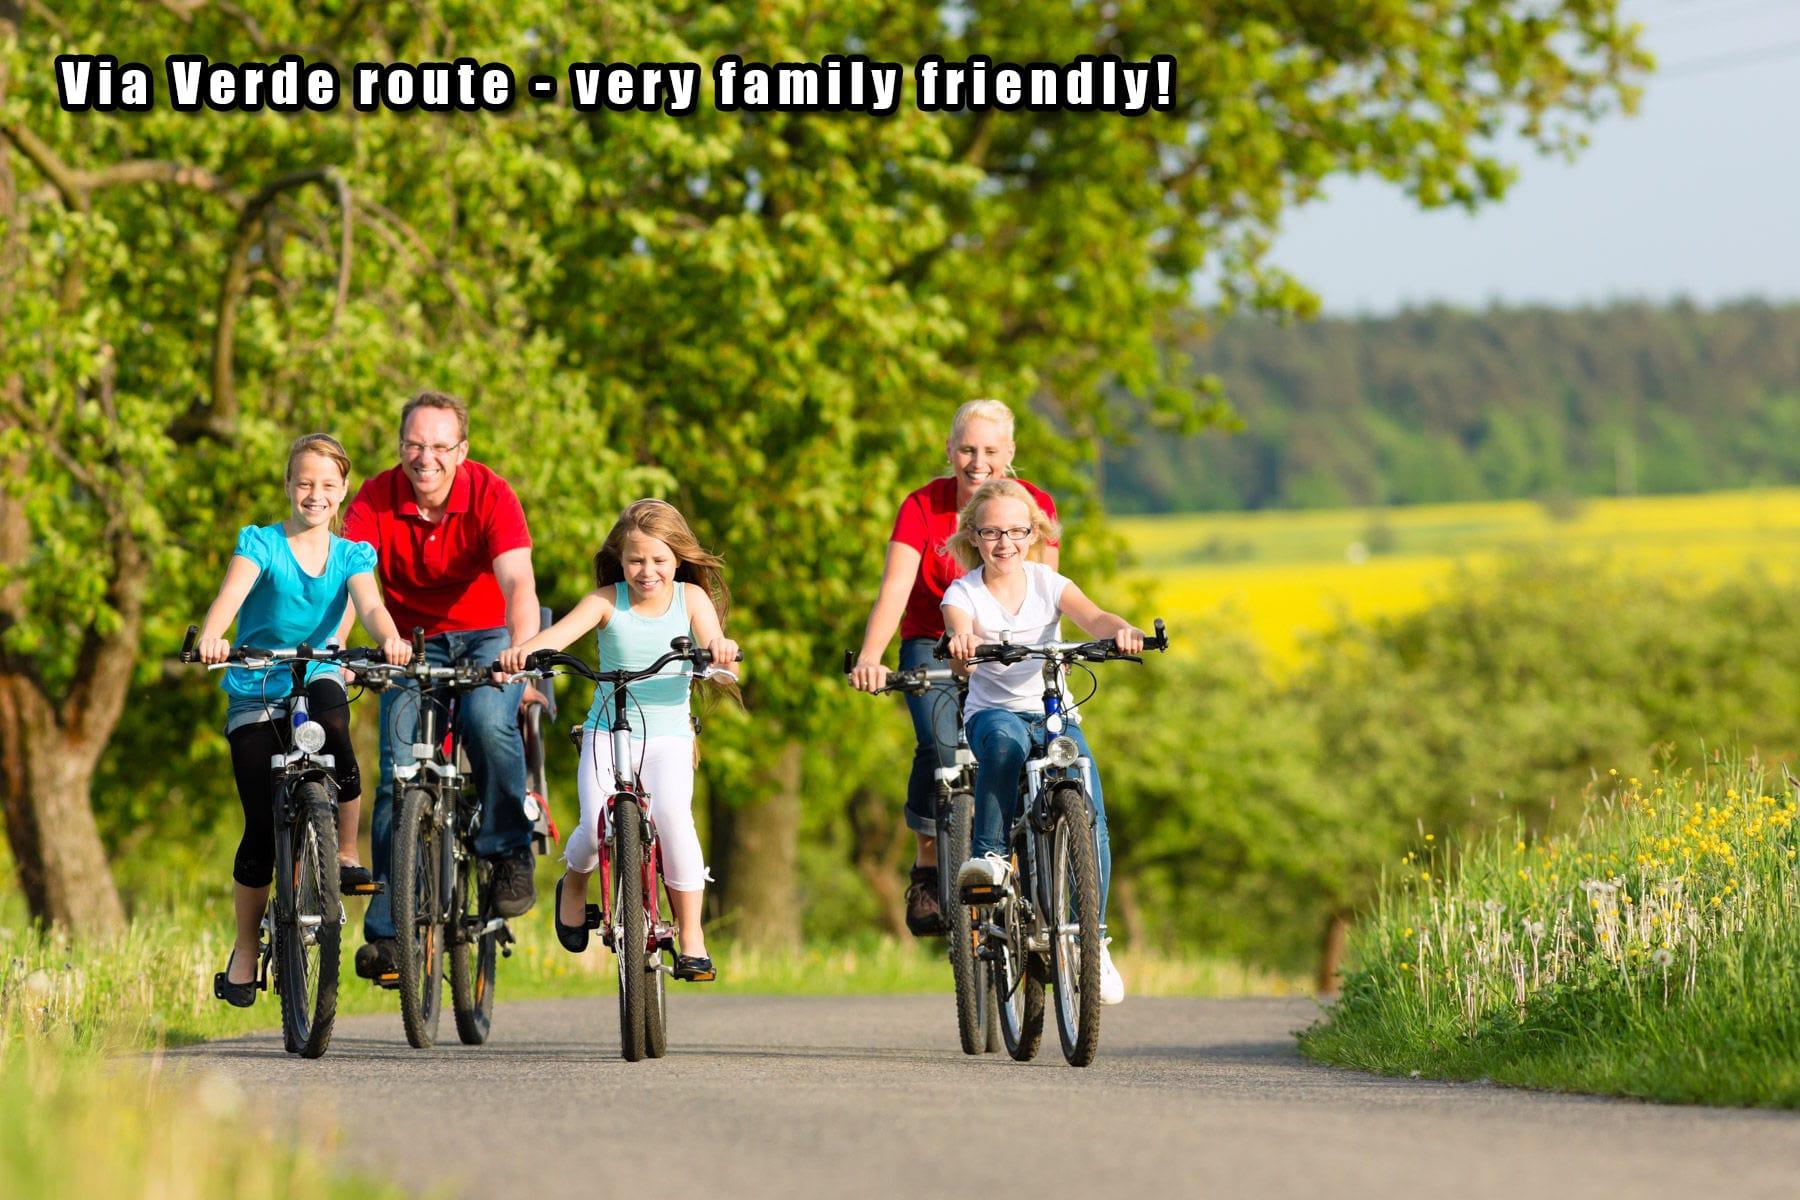 Sierra MTB Family friendly Via Verde route